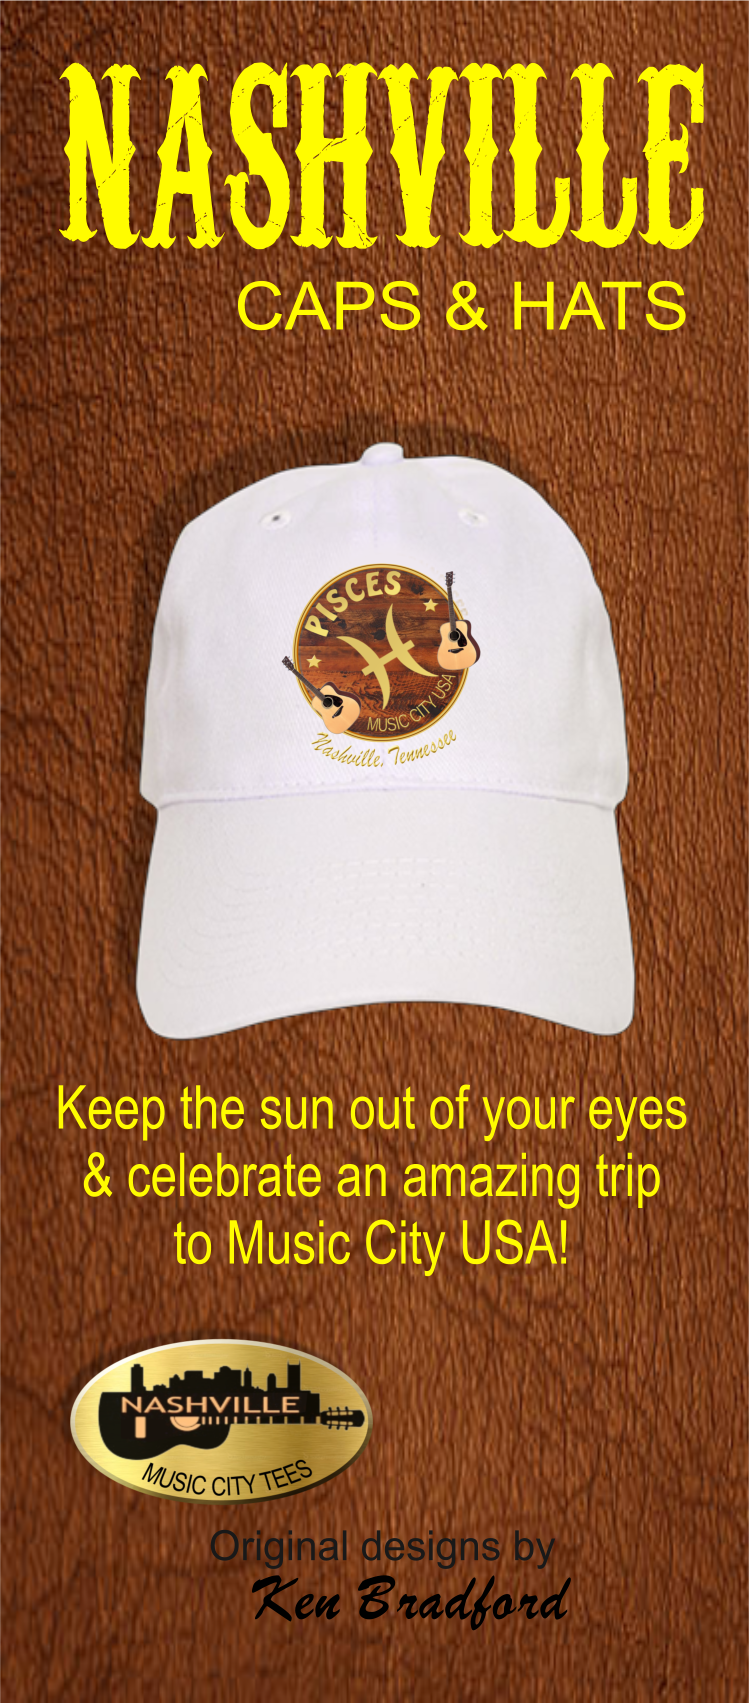 Nashville Zodiac Pisces Trucker Hat Zazzle Com Nashville Caps Hats Hats Pisces Zodiac Zodiac